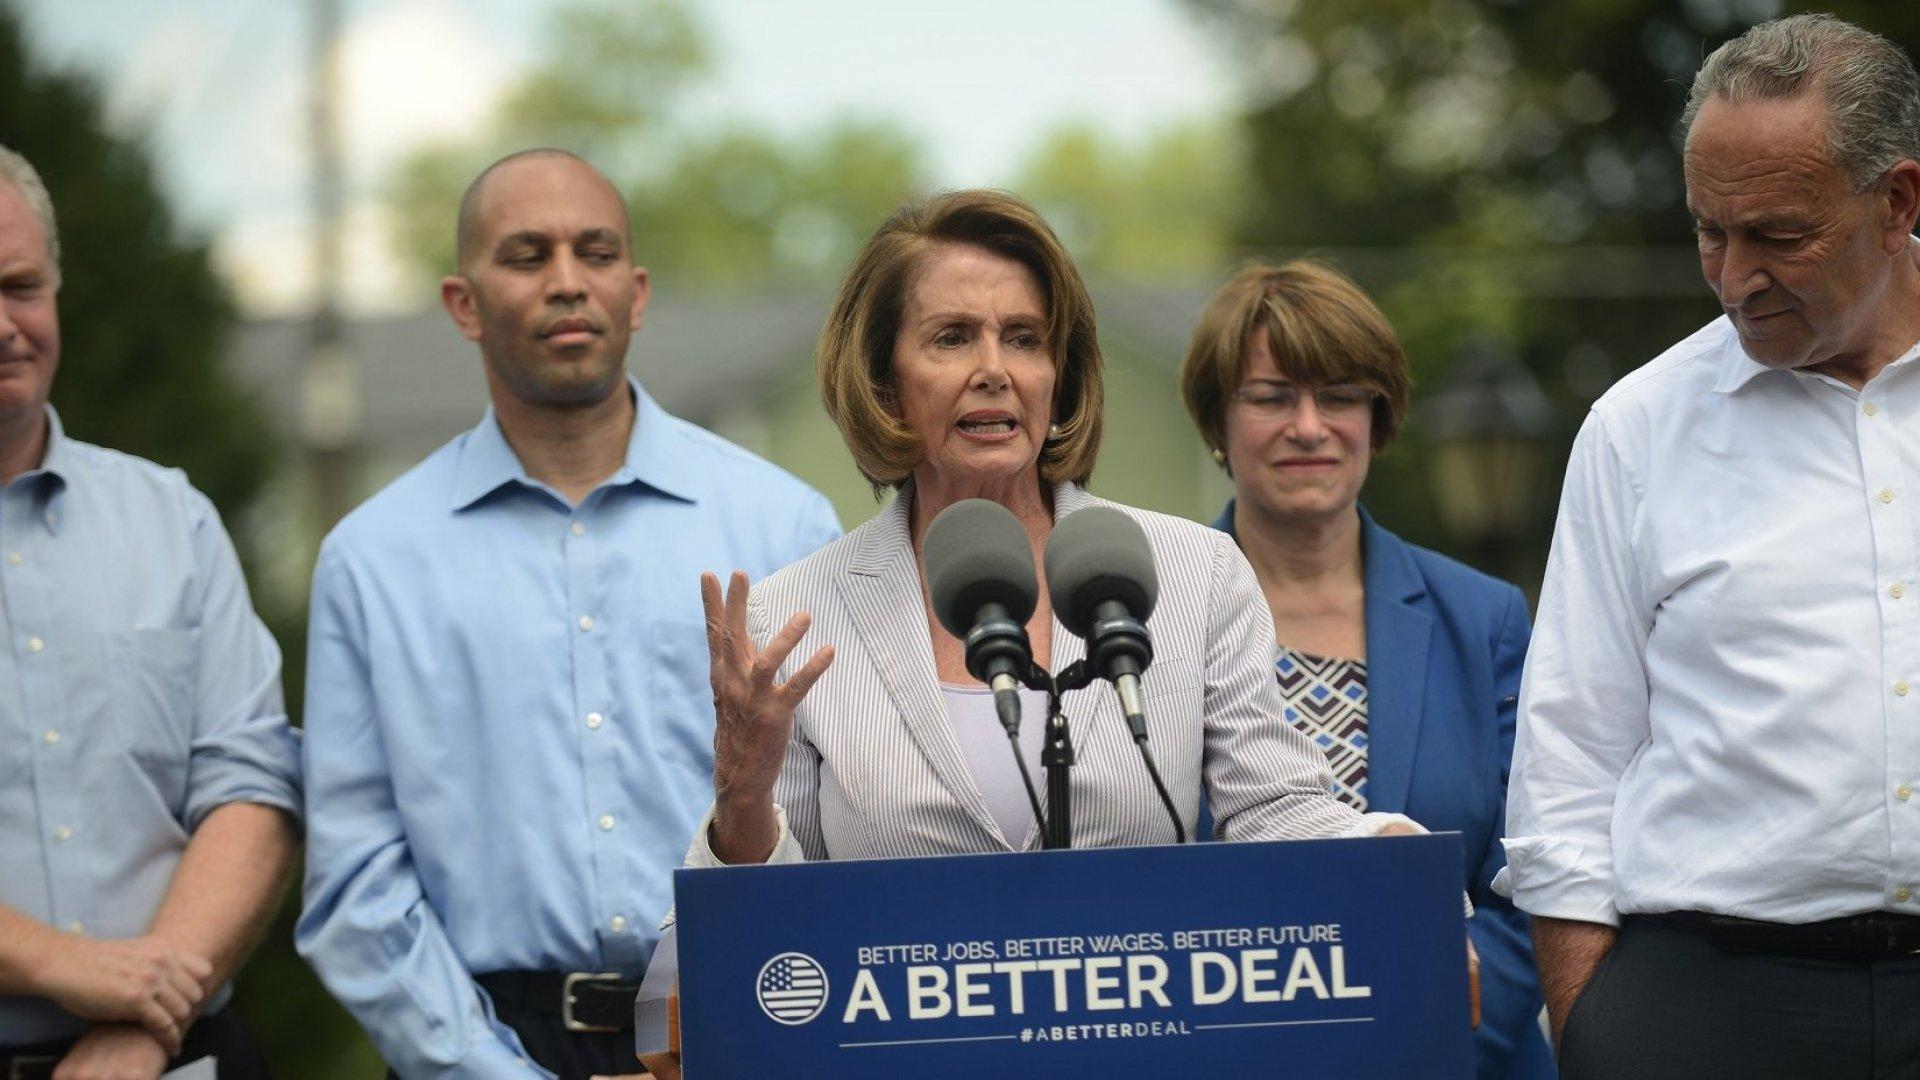 From left: Rep. Chris Van Hollen (D-Md.), Rep. Hakeem Jeffries (D-N.Y.), House Minority Leader Nancy Pelosi (D-Calif.), Sen. Amy Klobuchar (D-Minn.), and Senate Minority Leader Chuck Schumer (D-N.Y.) in Berryville, Va., on July 24.